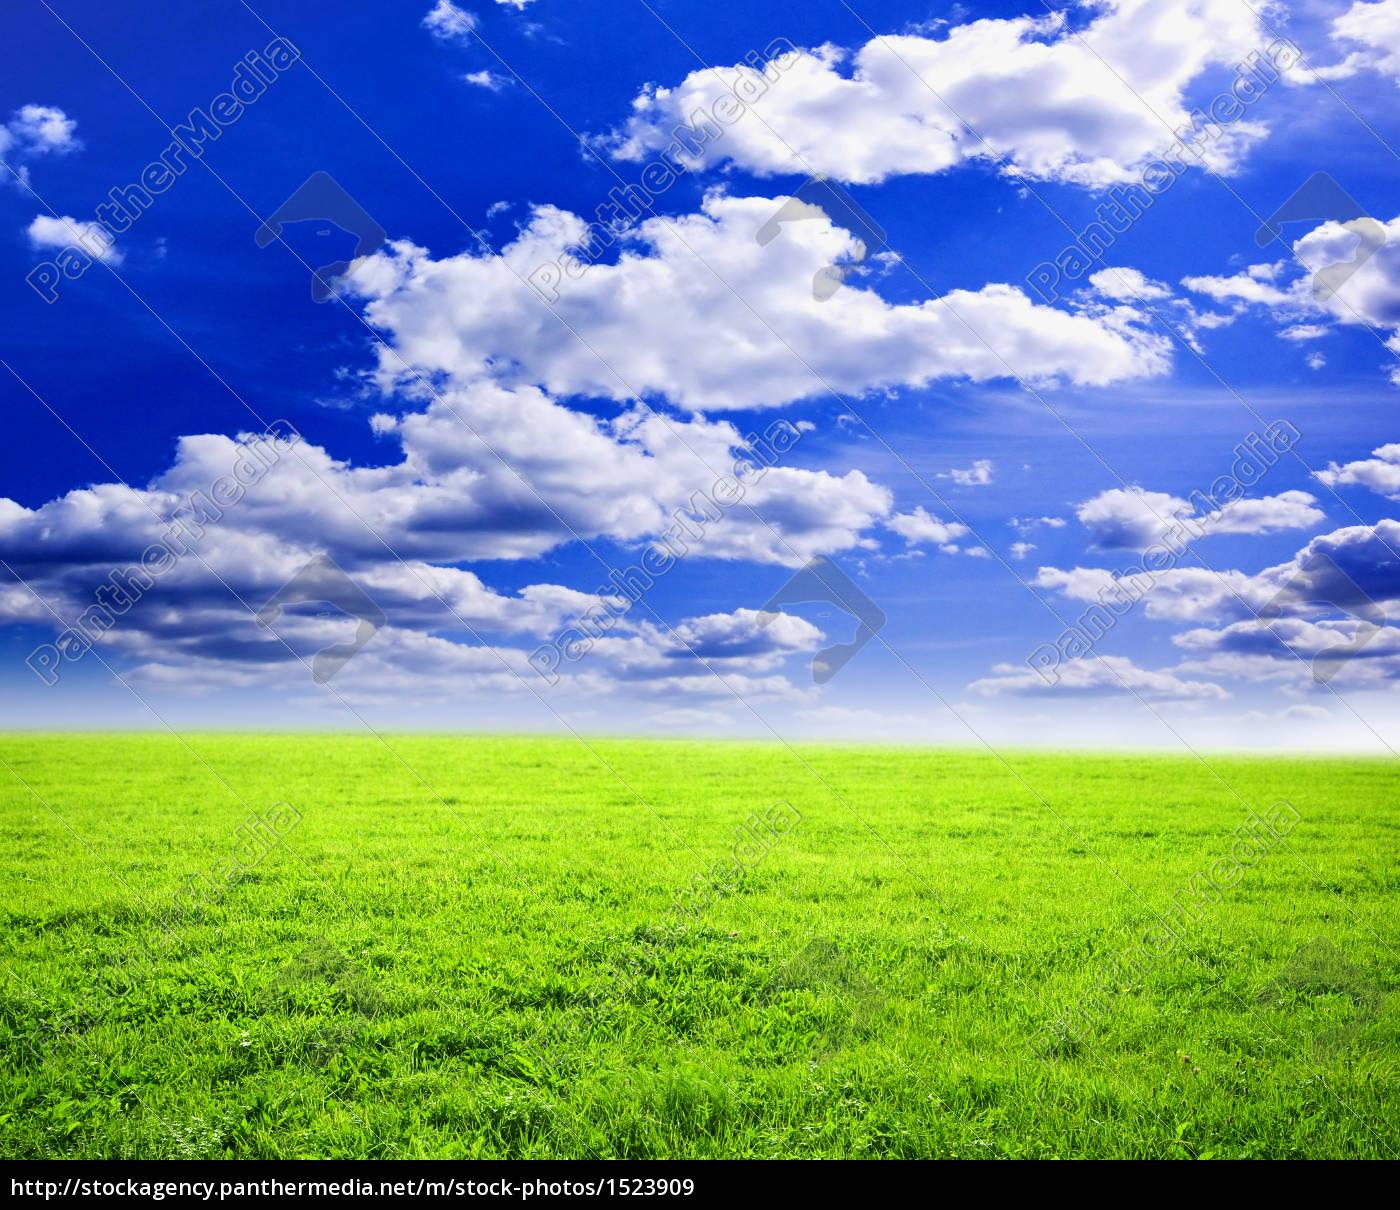 wonderful, summer, landscape - 1523909